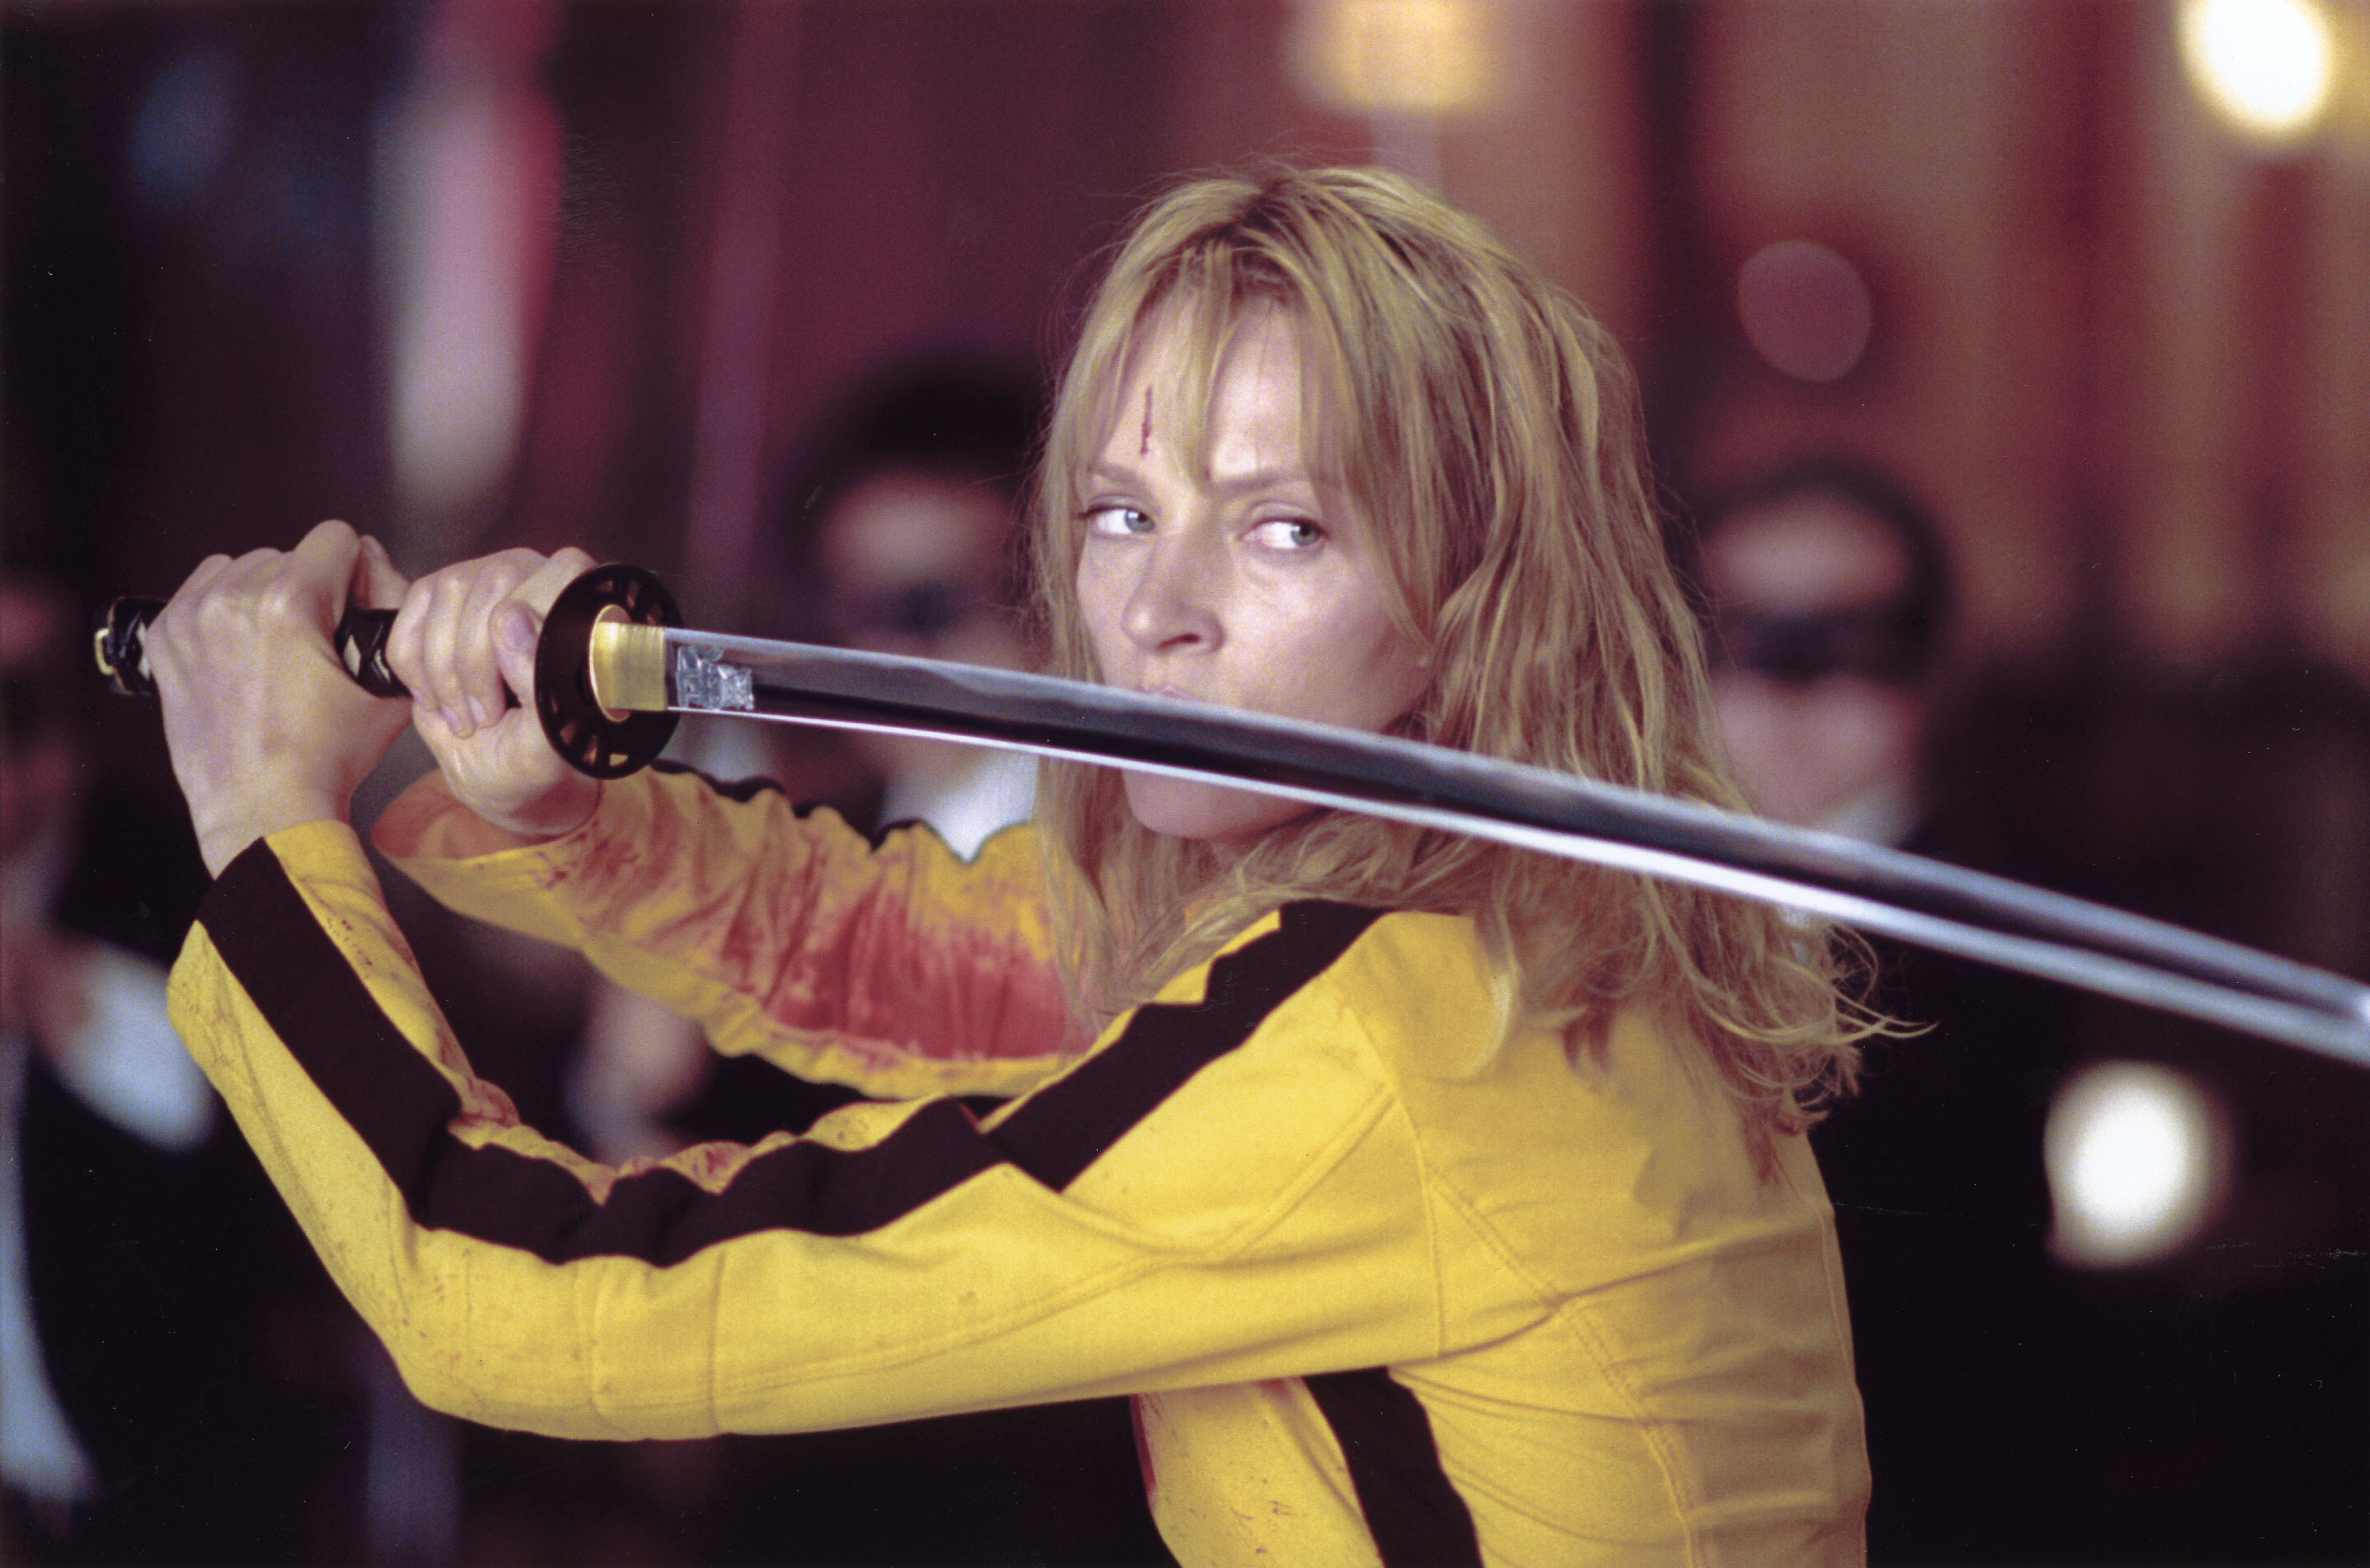 Uma Thurman as The Bride in kill Bill Vol 1, Inspiring Leading Ladies